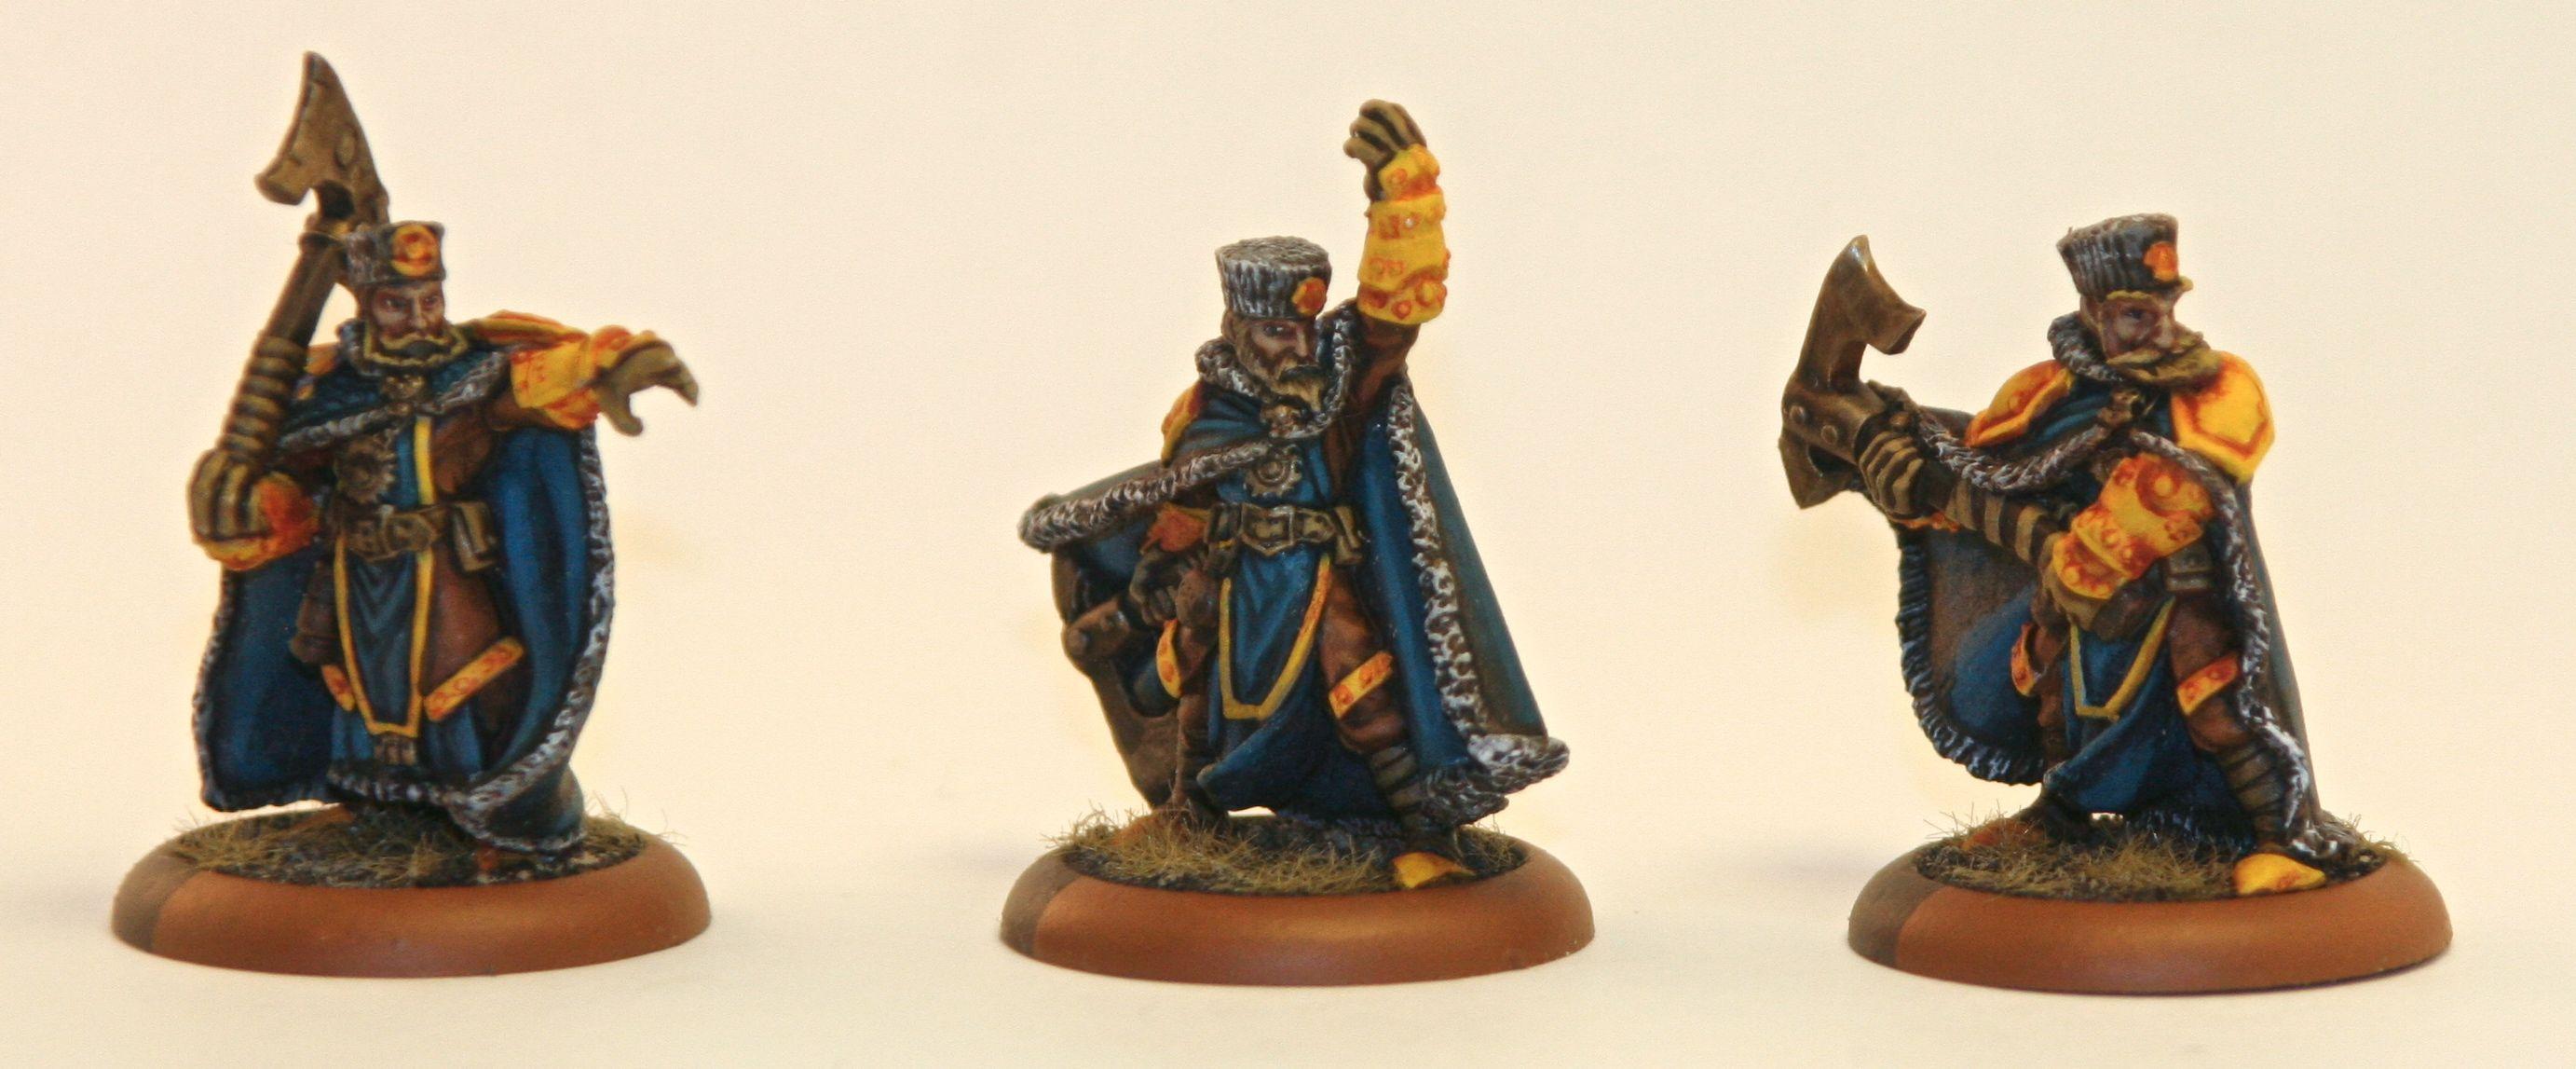 Greylord, Greylord Ternion, Hordes, Khador, Ternion, Warmachine